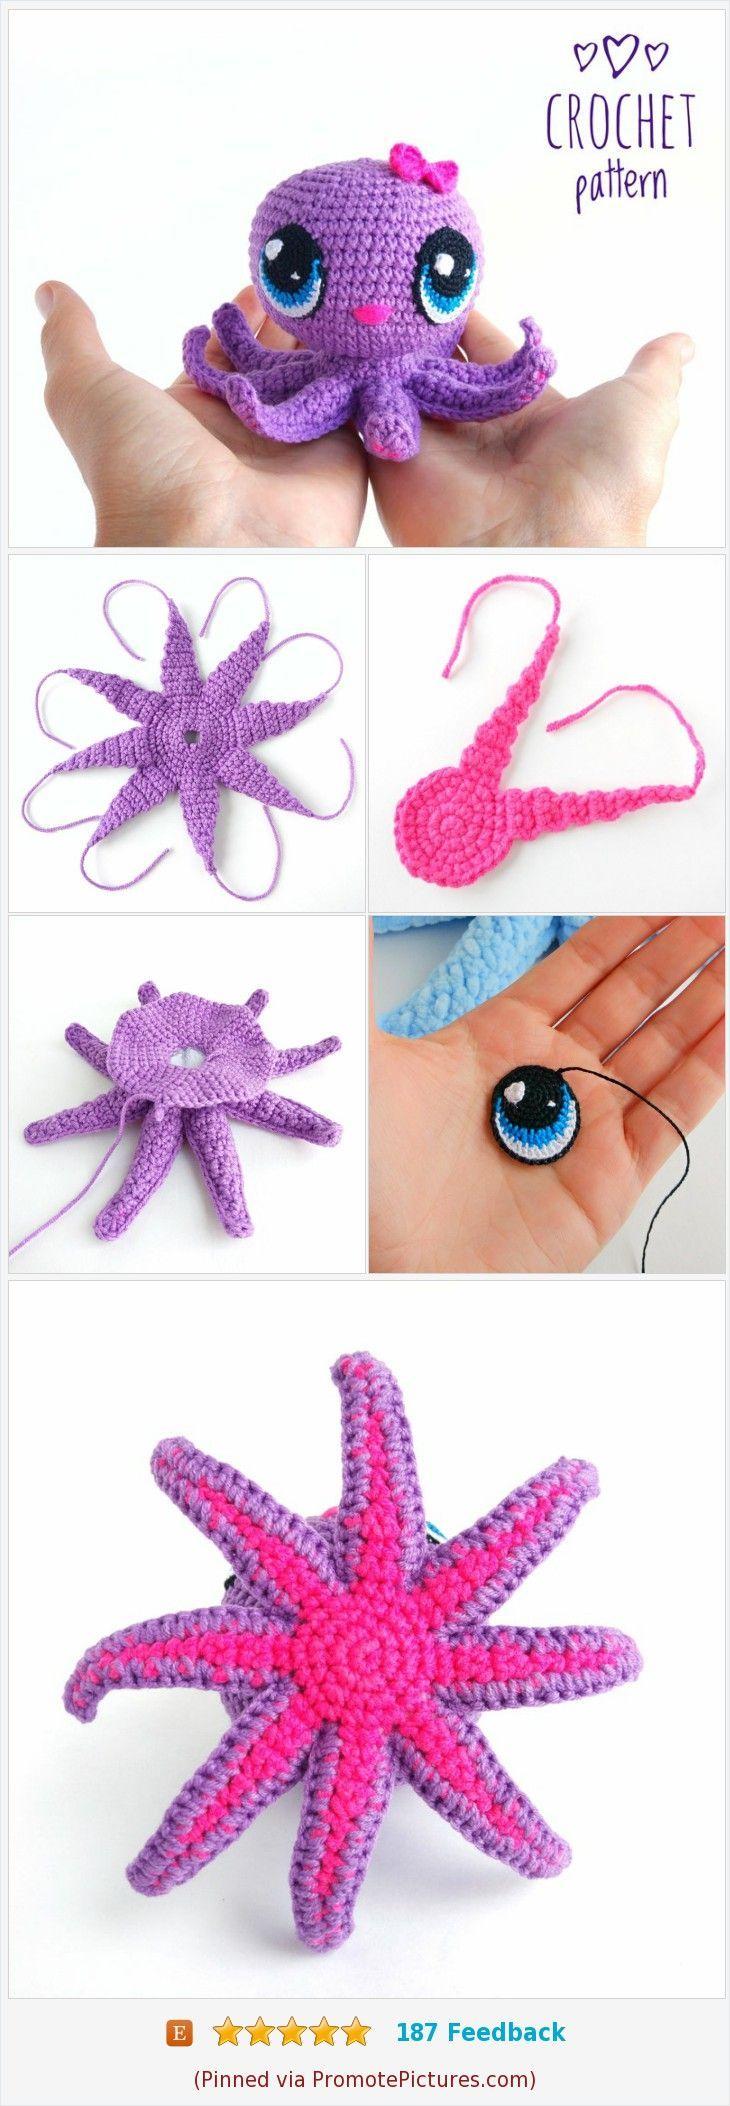 CROCHET OCTOPUS PATTERN – Amigurumi Octopus with big eyes – Crochet sea animals …